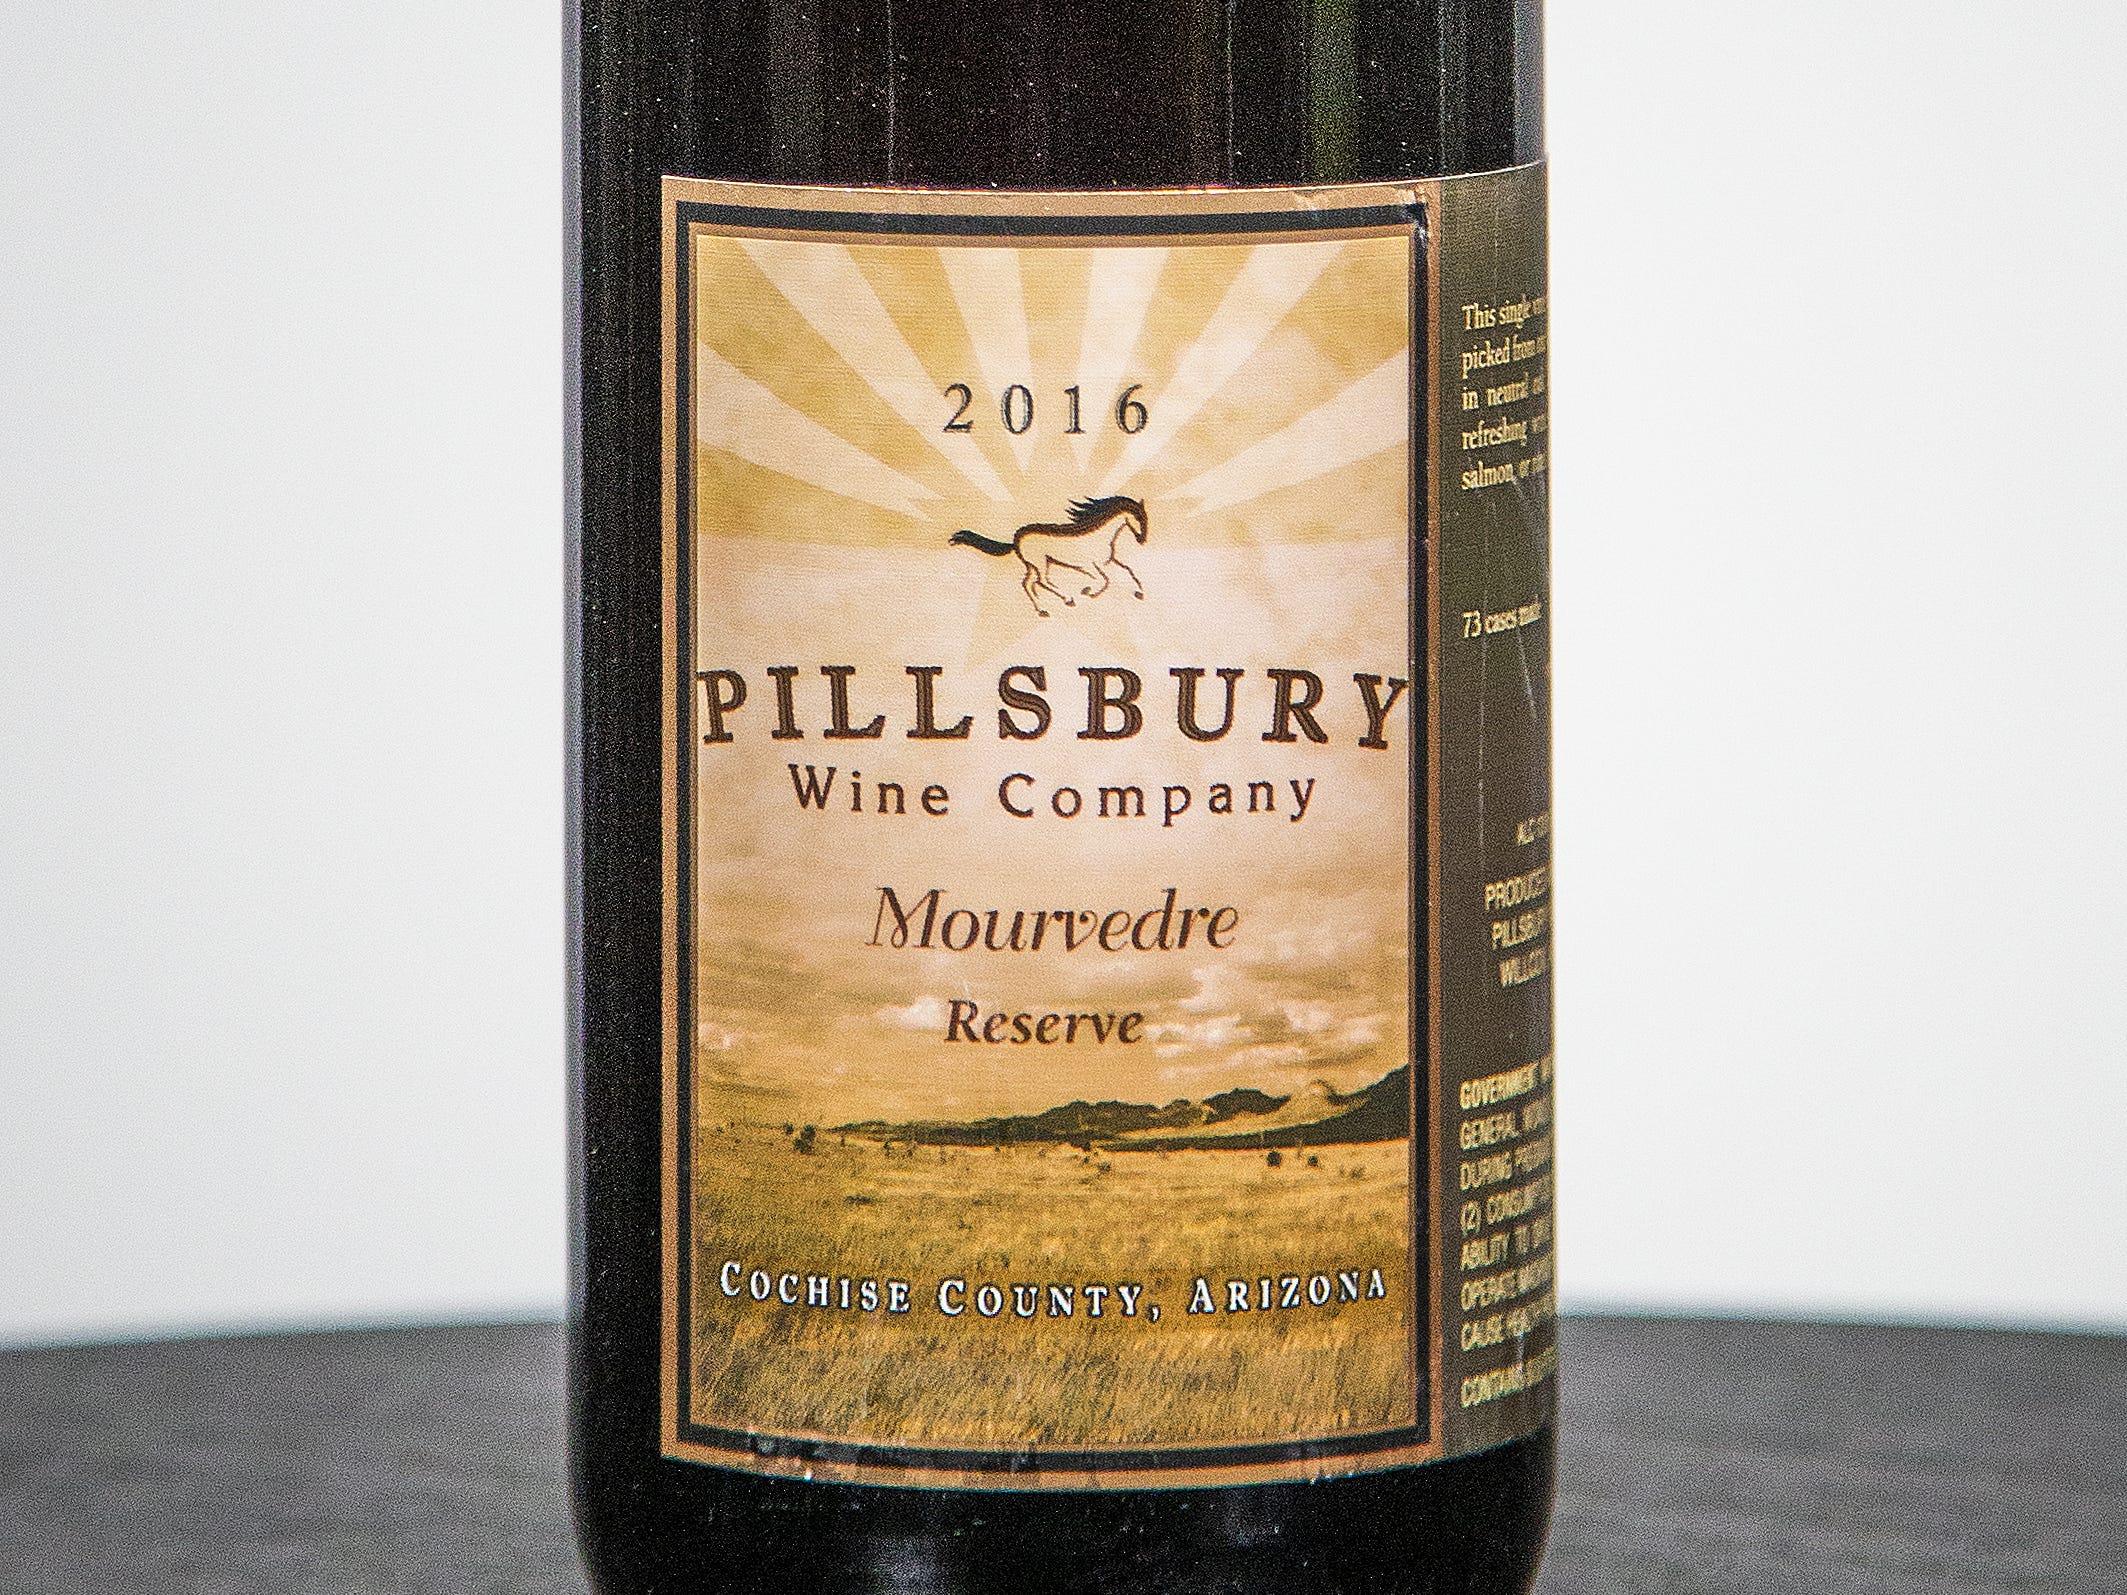 Best Mourvedre / Monastrell: Pillsbury Wine Company Mourvedre Reserve 2016.